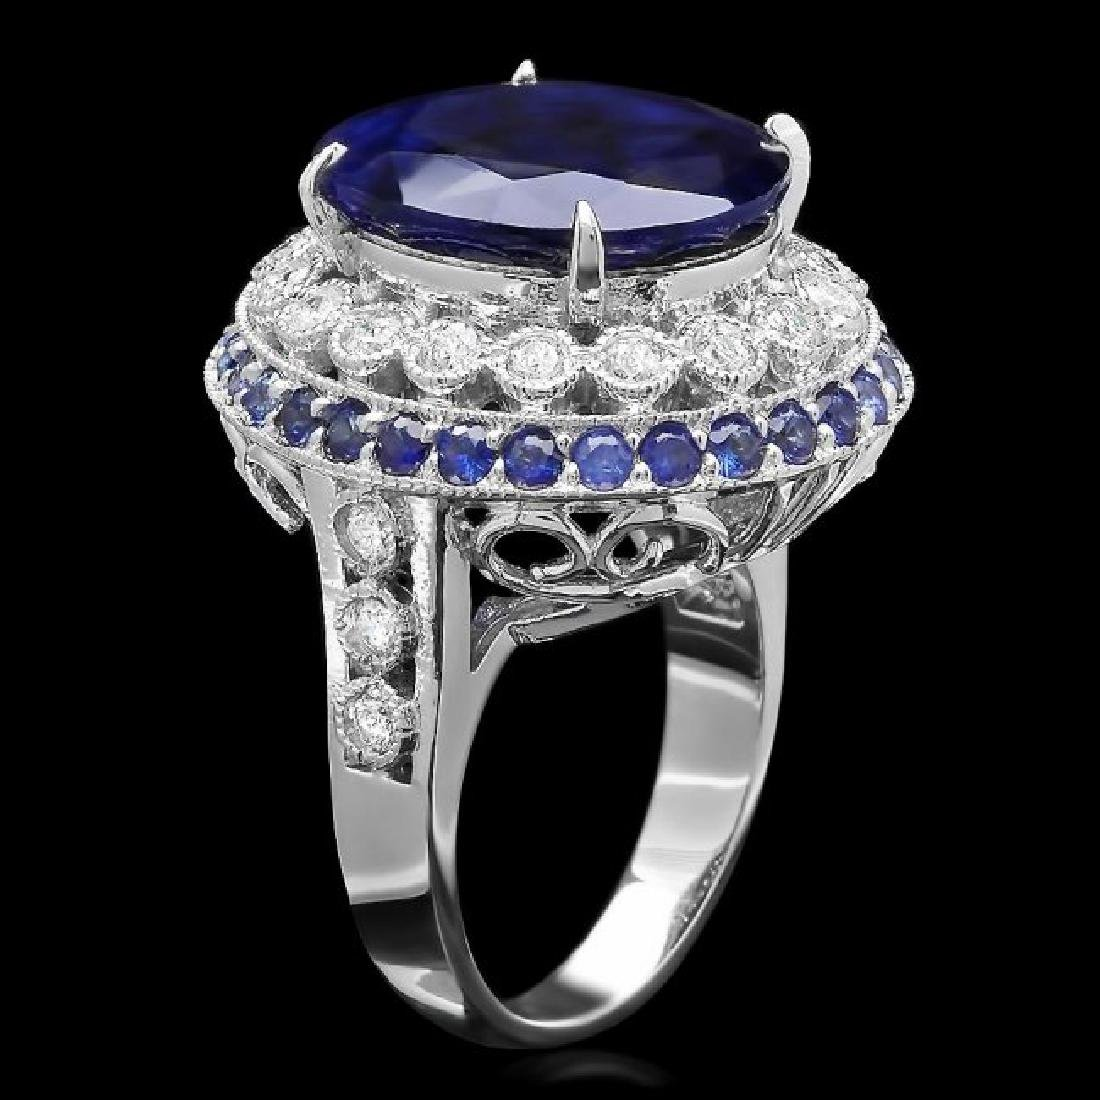 14k Gold 14.7ct Sapphire 0.80ct Diamond Ring - 2